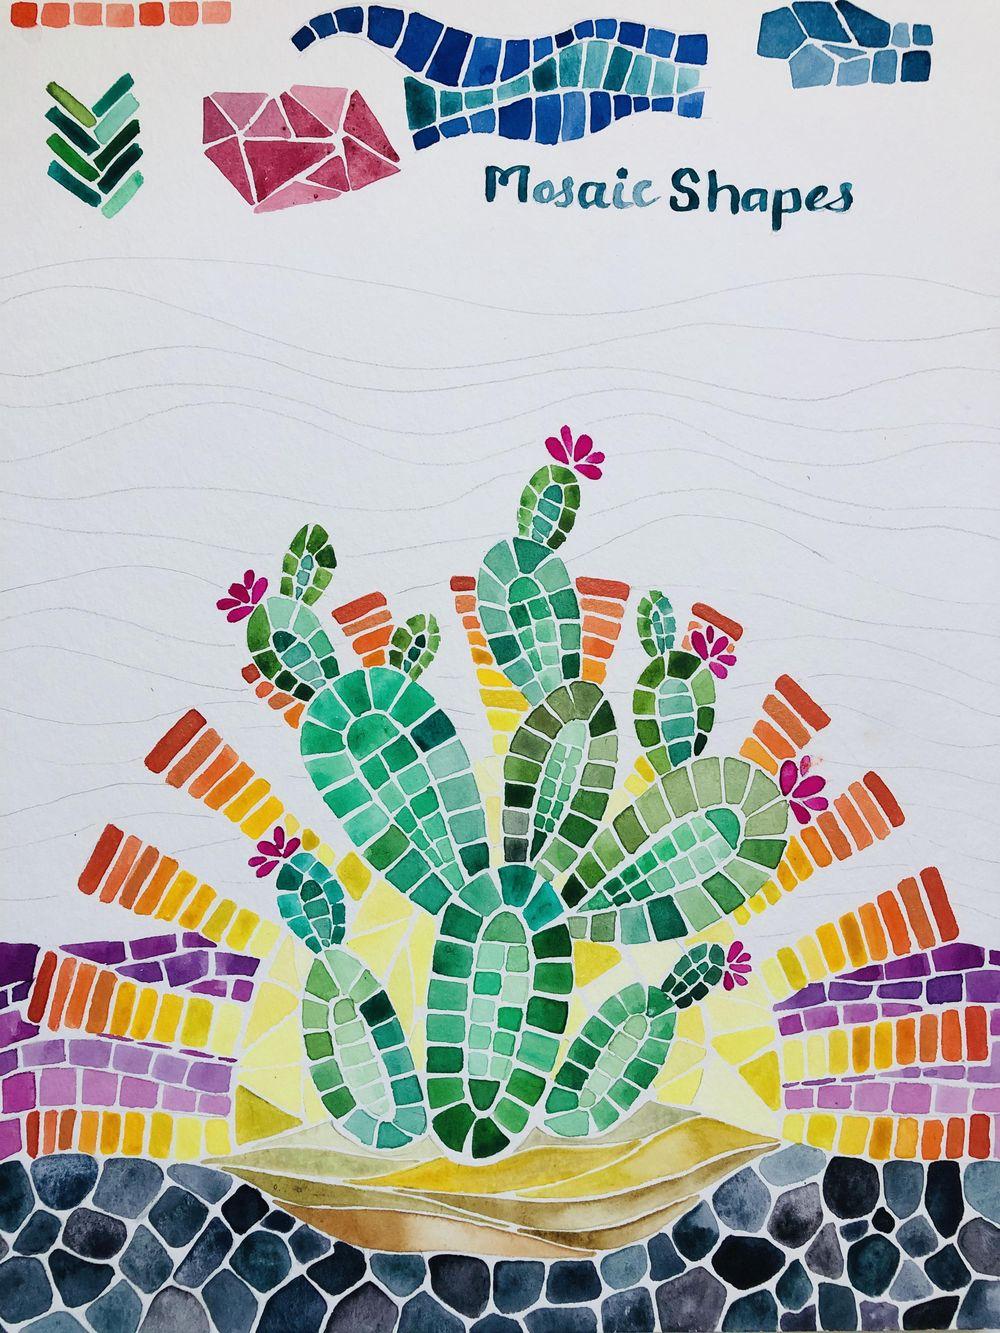 Desert Cacti Horizon Watercolor Mosaic process and final piece - image 3 - student project